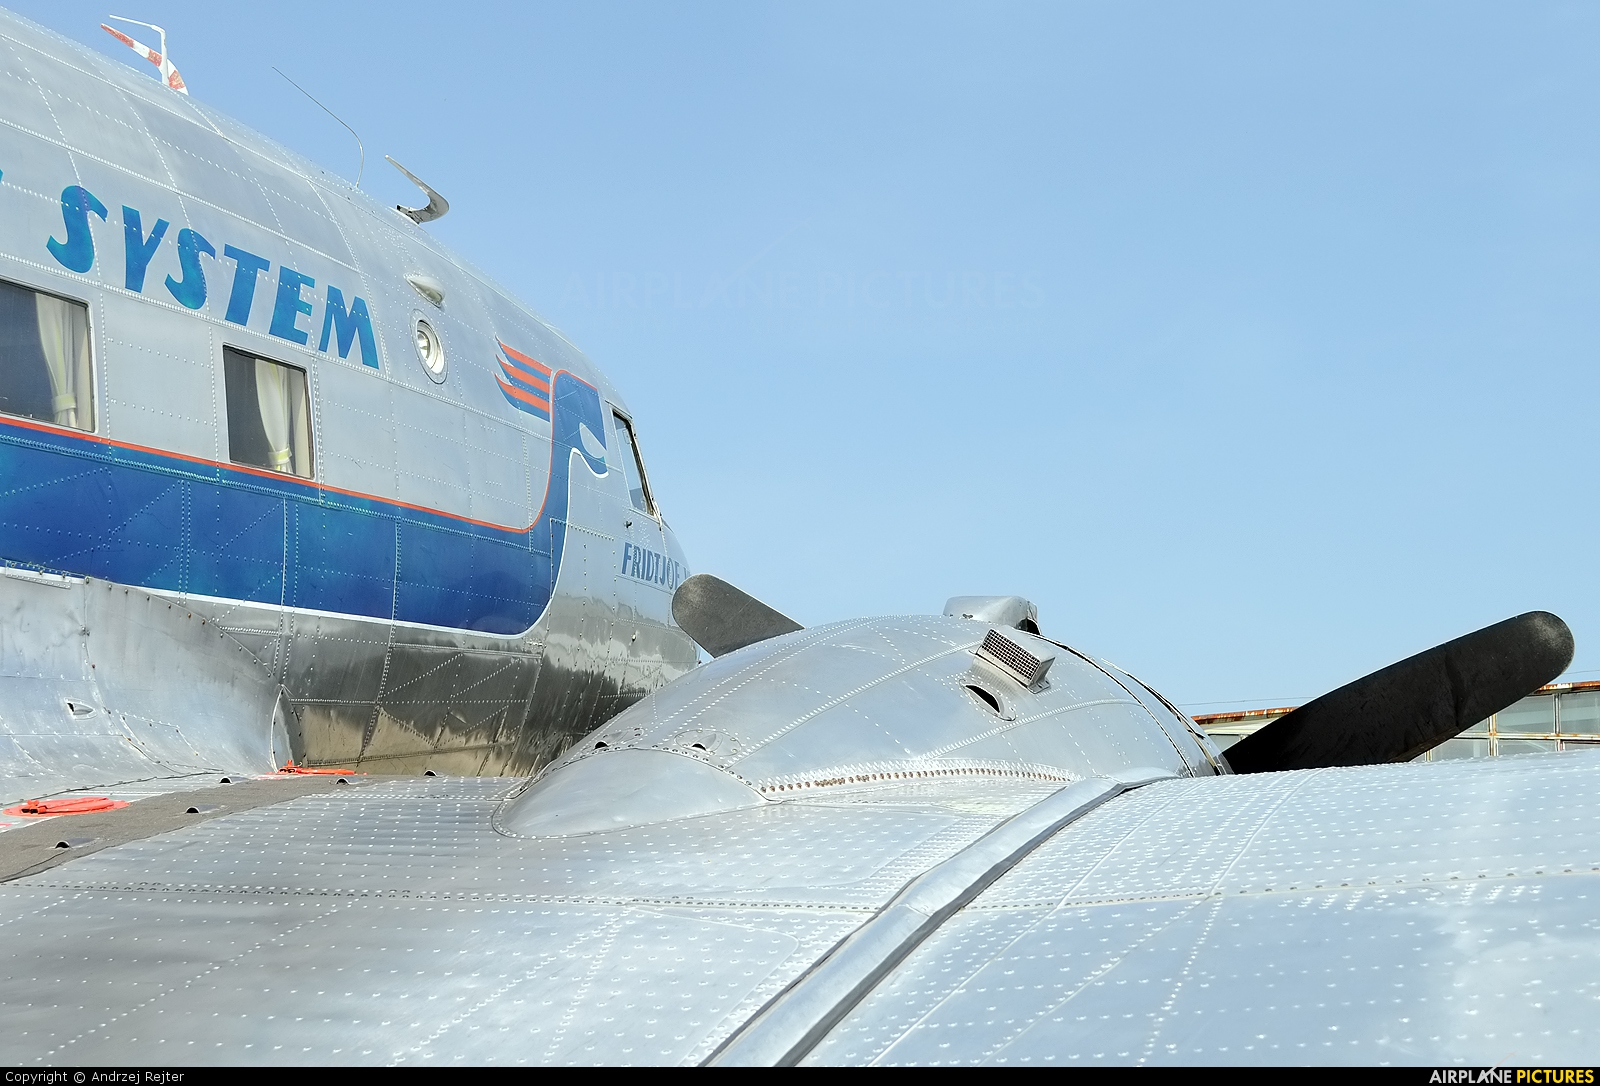 SAS - Flygande Veteraner SE-CFP aircraft at Kętrzyn - Wilamowo